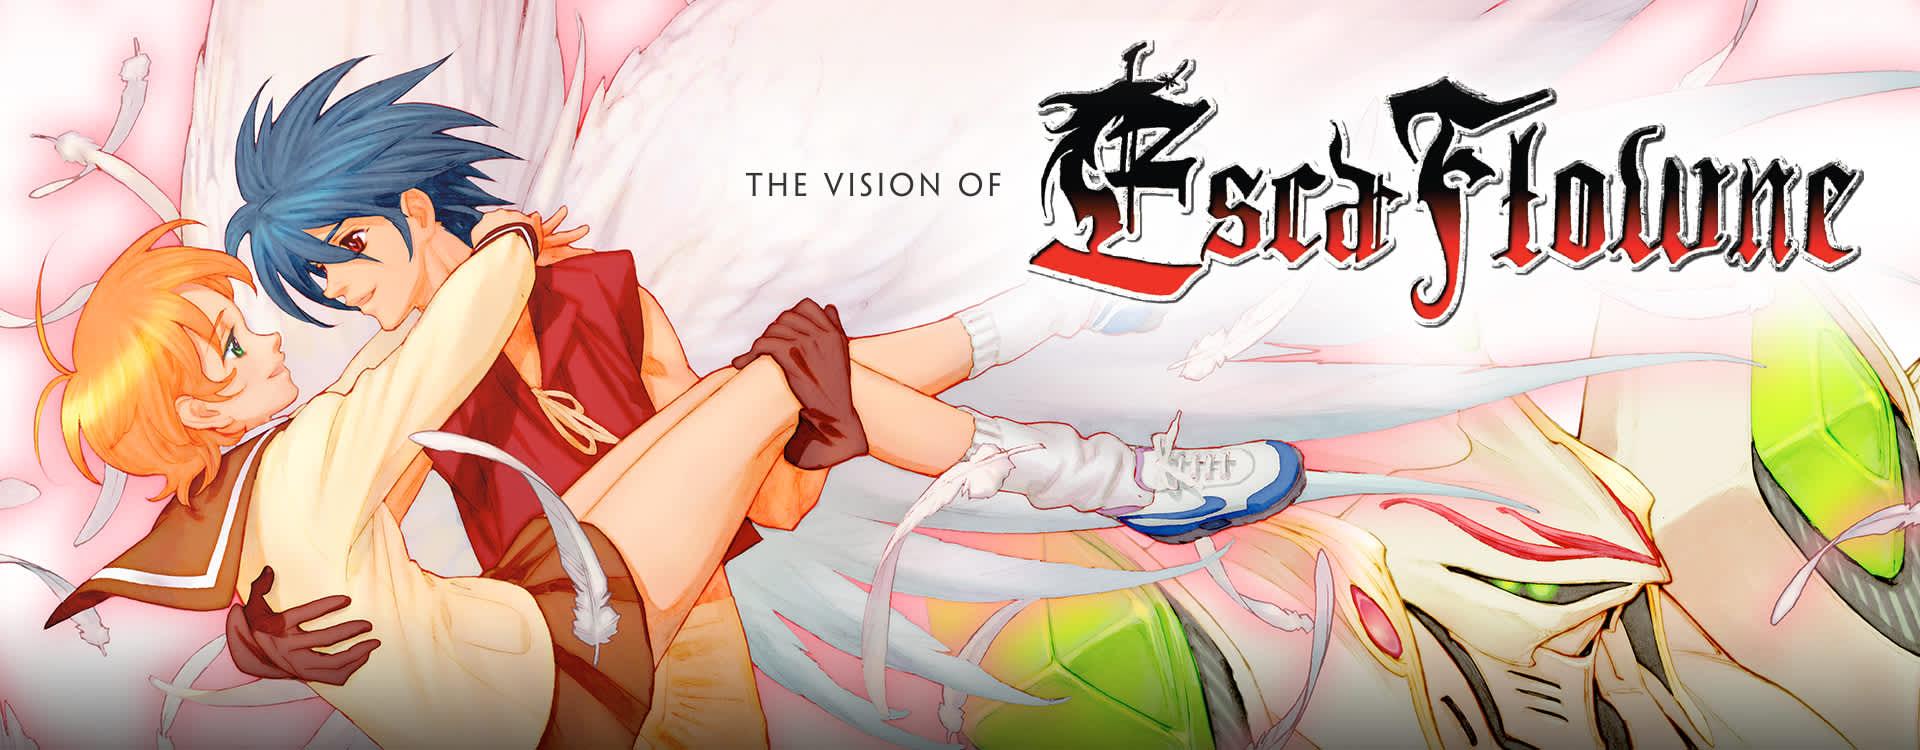 Vision Of Escaflowne Stream